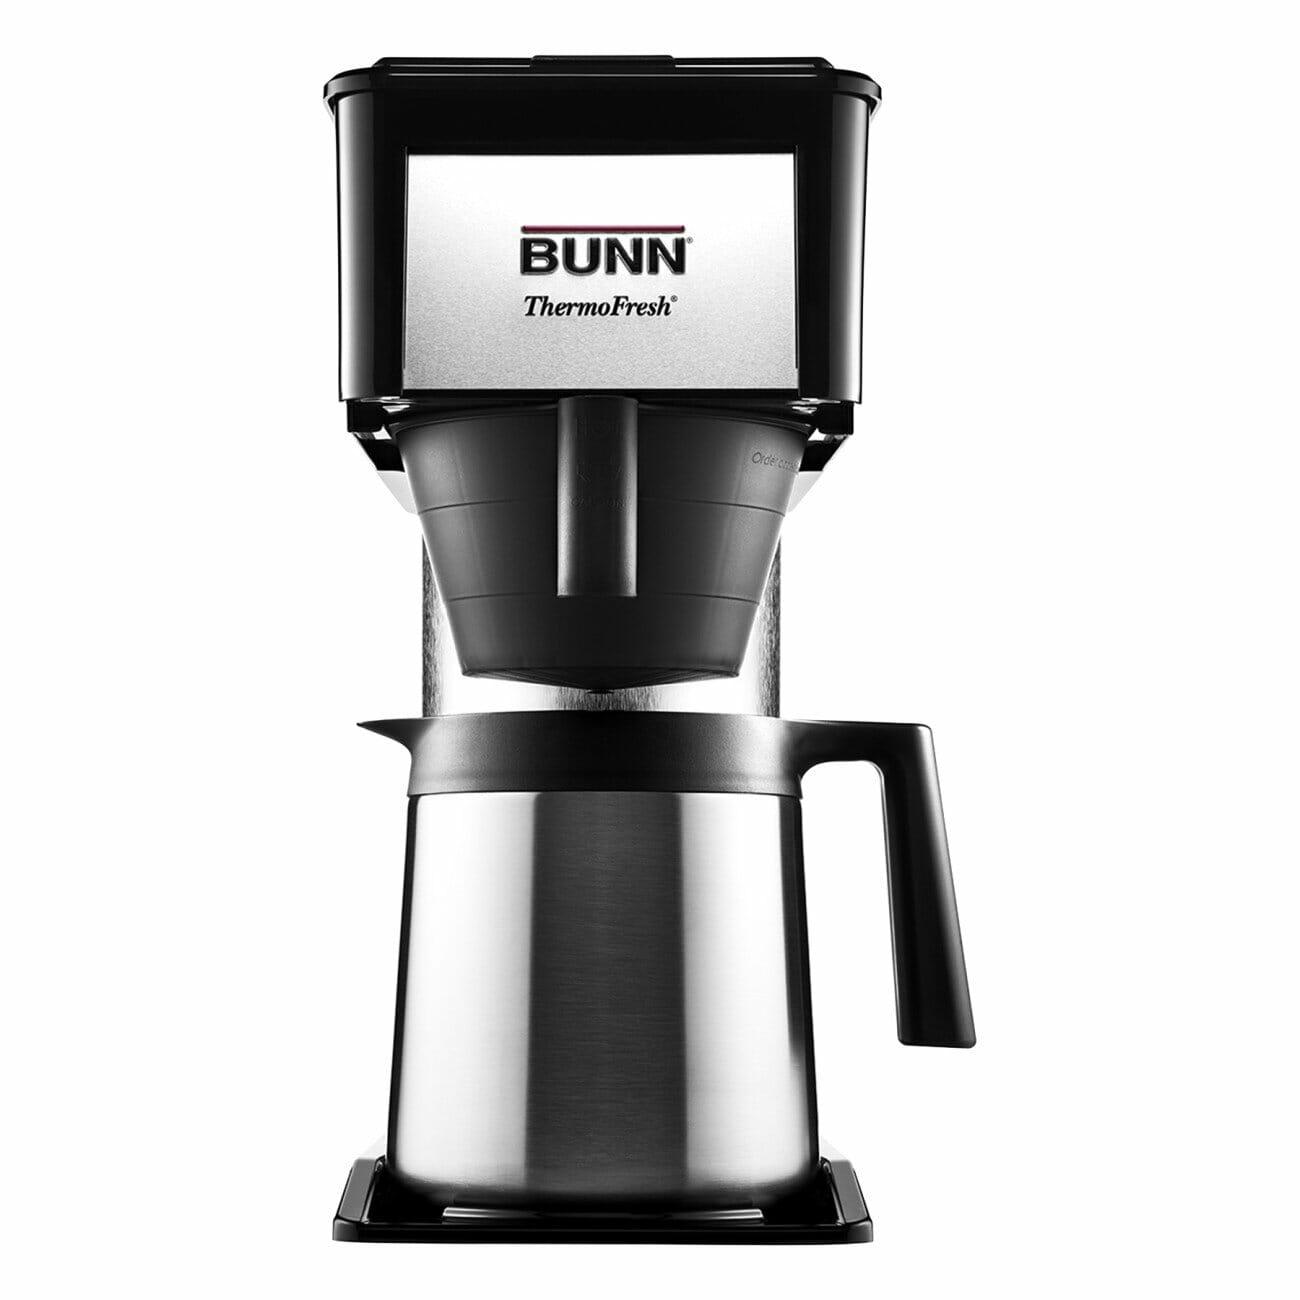 BT Velocity Brew Coffee Maker Reviews